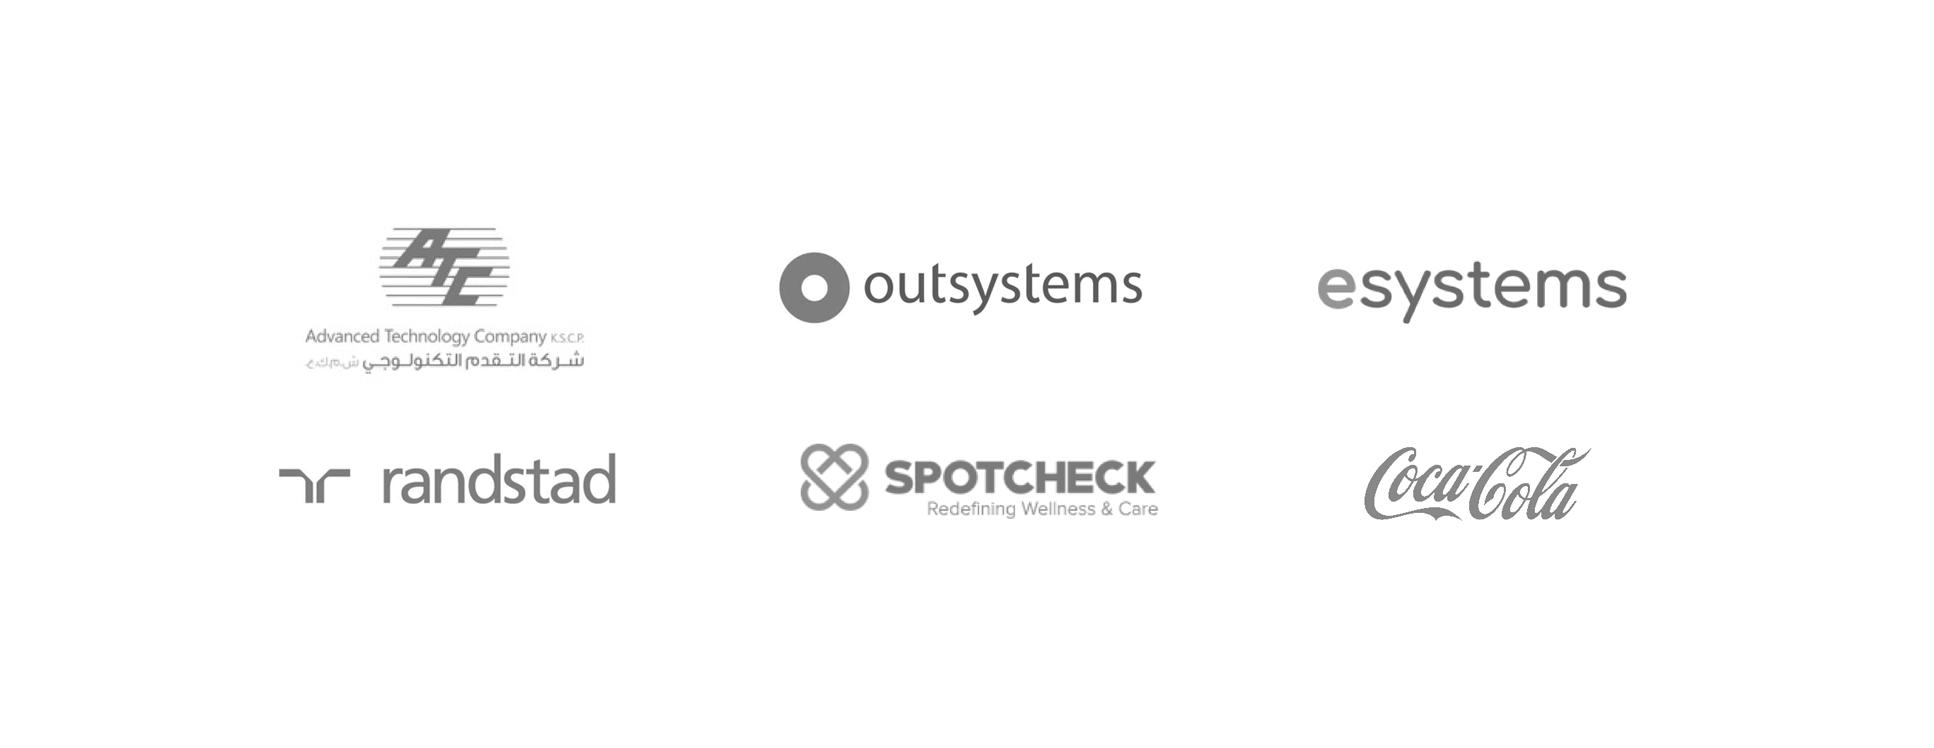 logos-updated-2